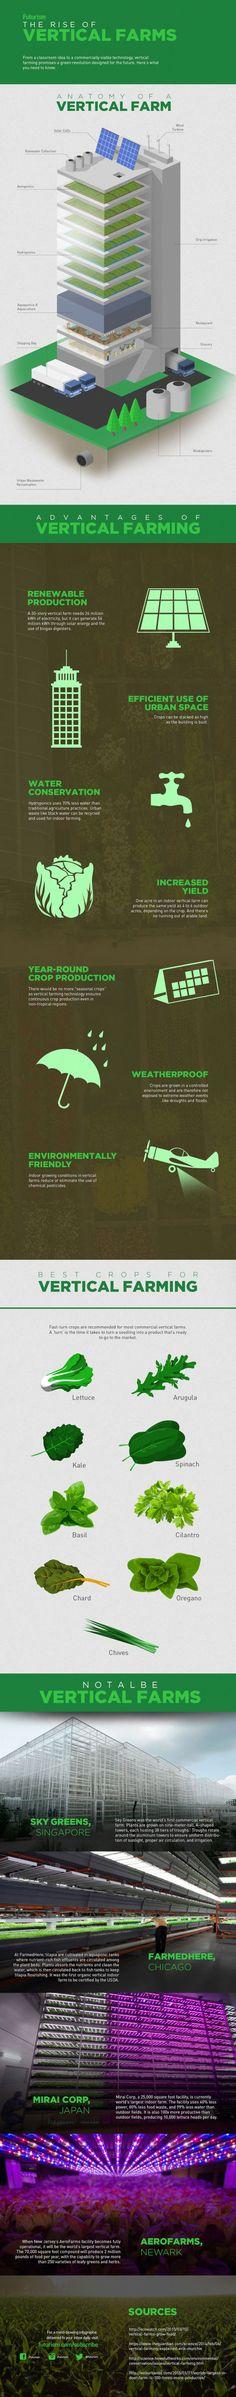 Futurism post: Vertical Farming - 9GAG